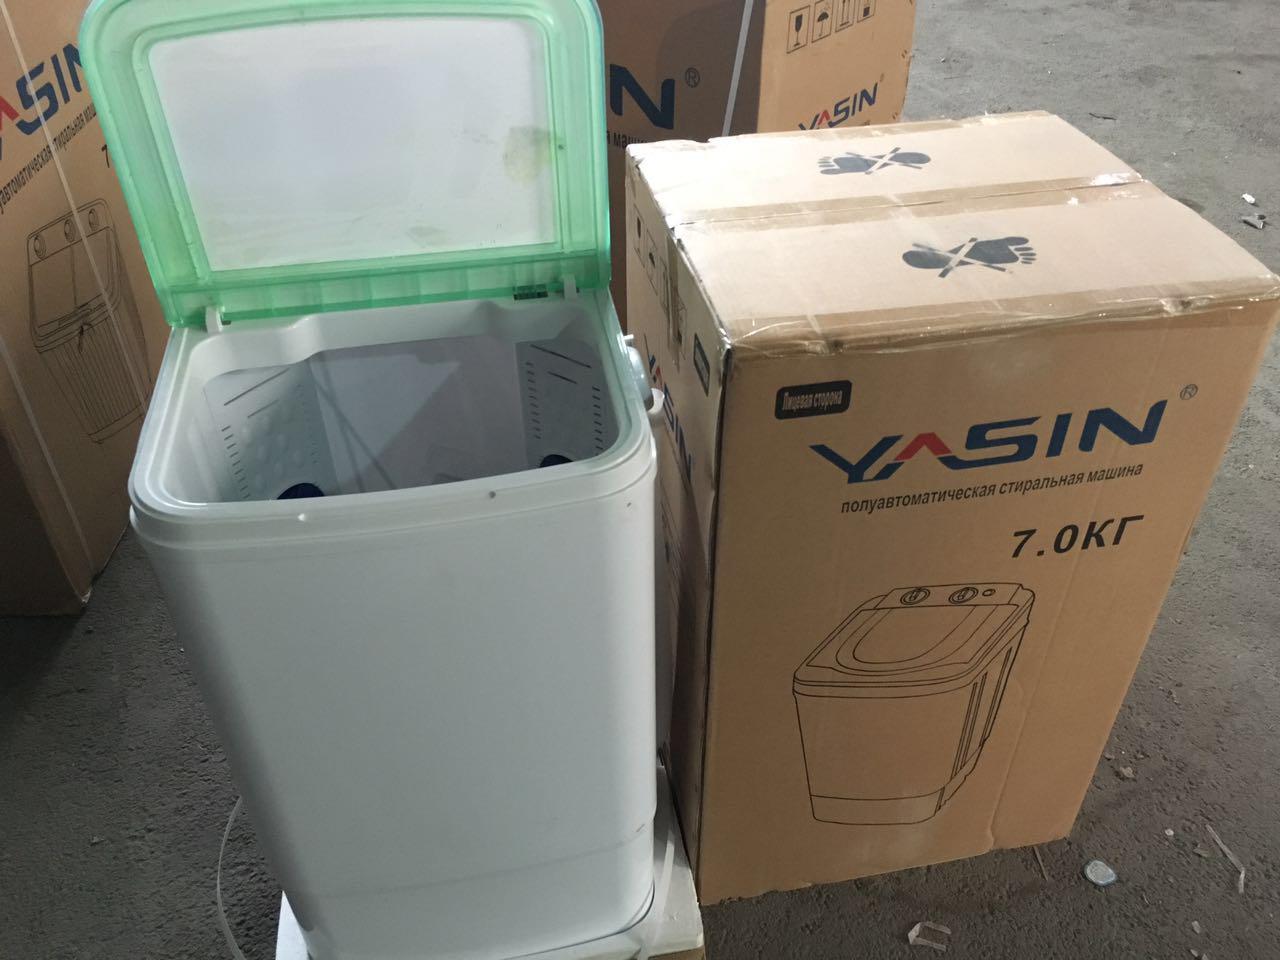 Стиральная машина YASIN XPB70-70SE без отжима